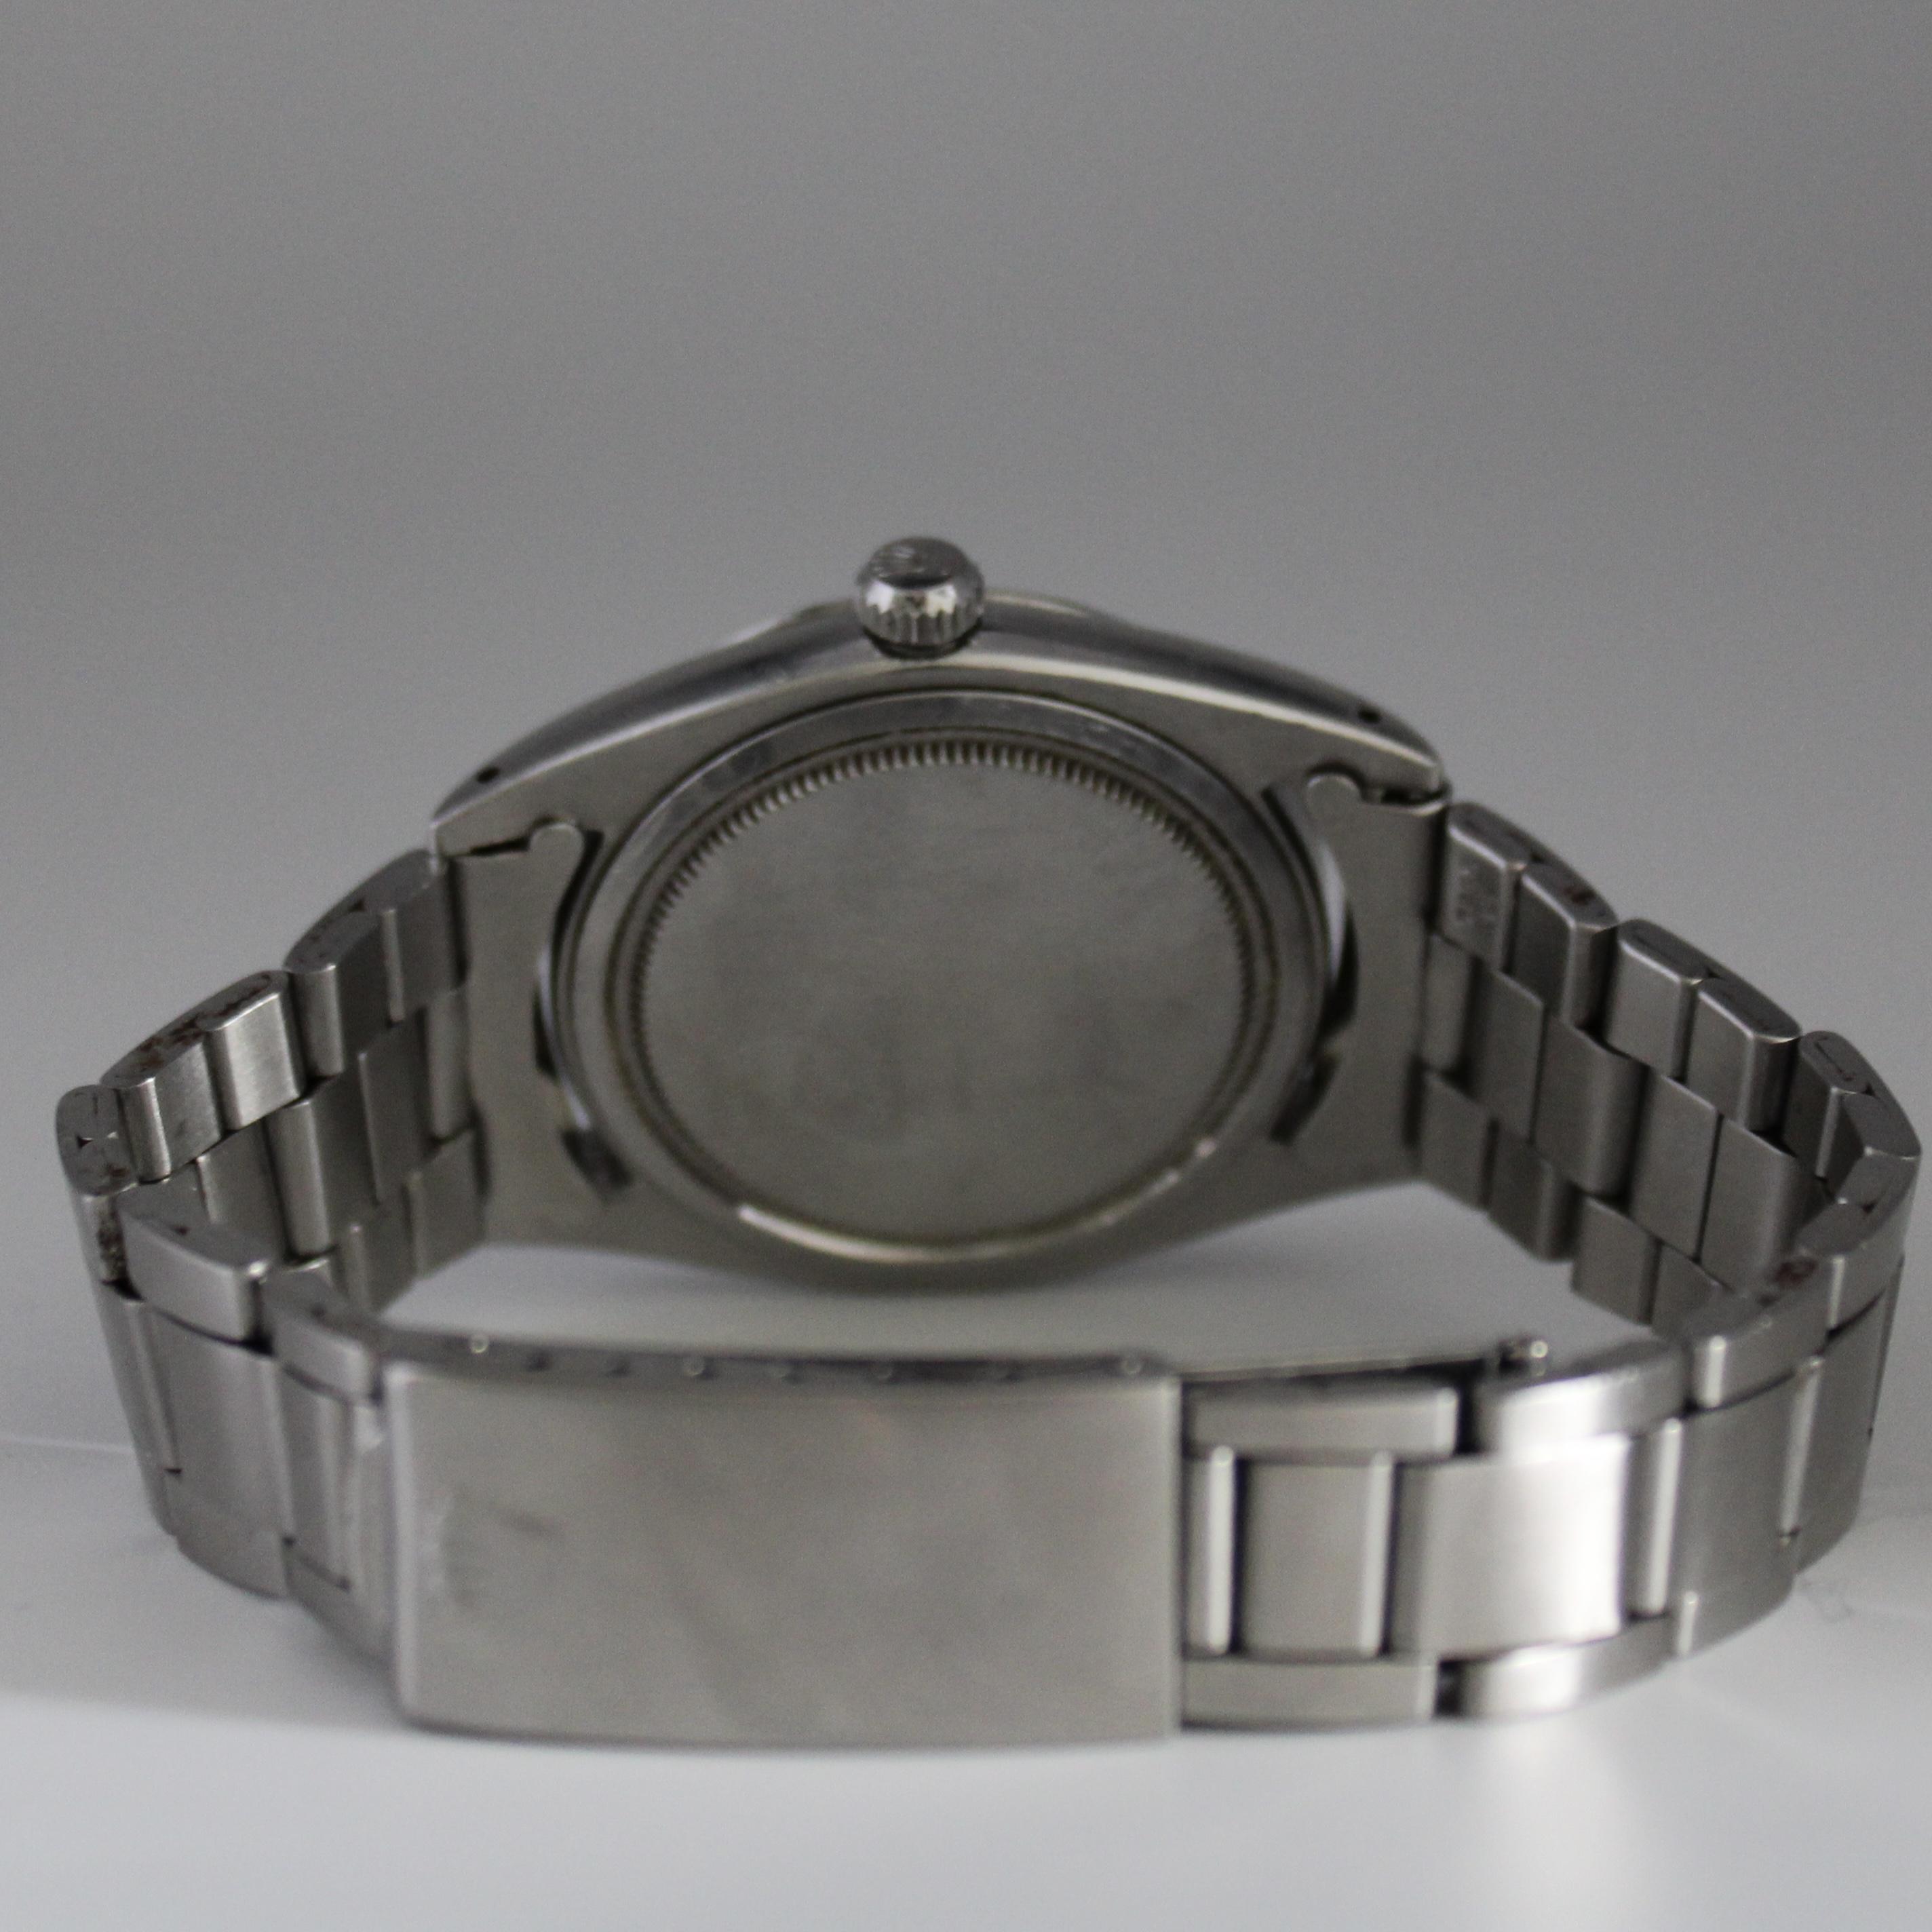 Rolex Oysterdate Precision ref 6694 - Image 6 of 6